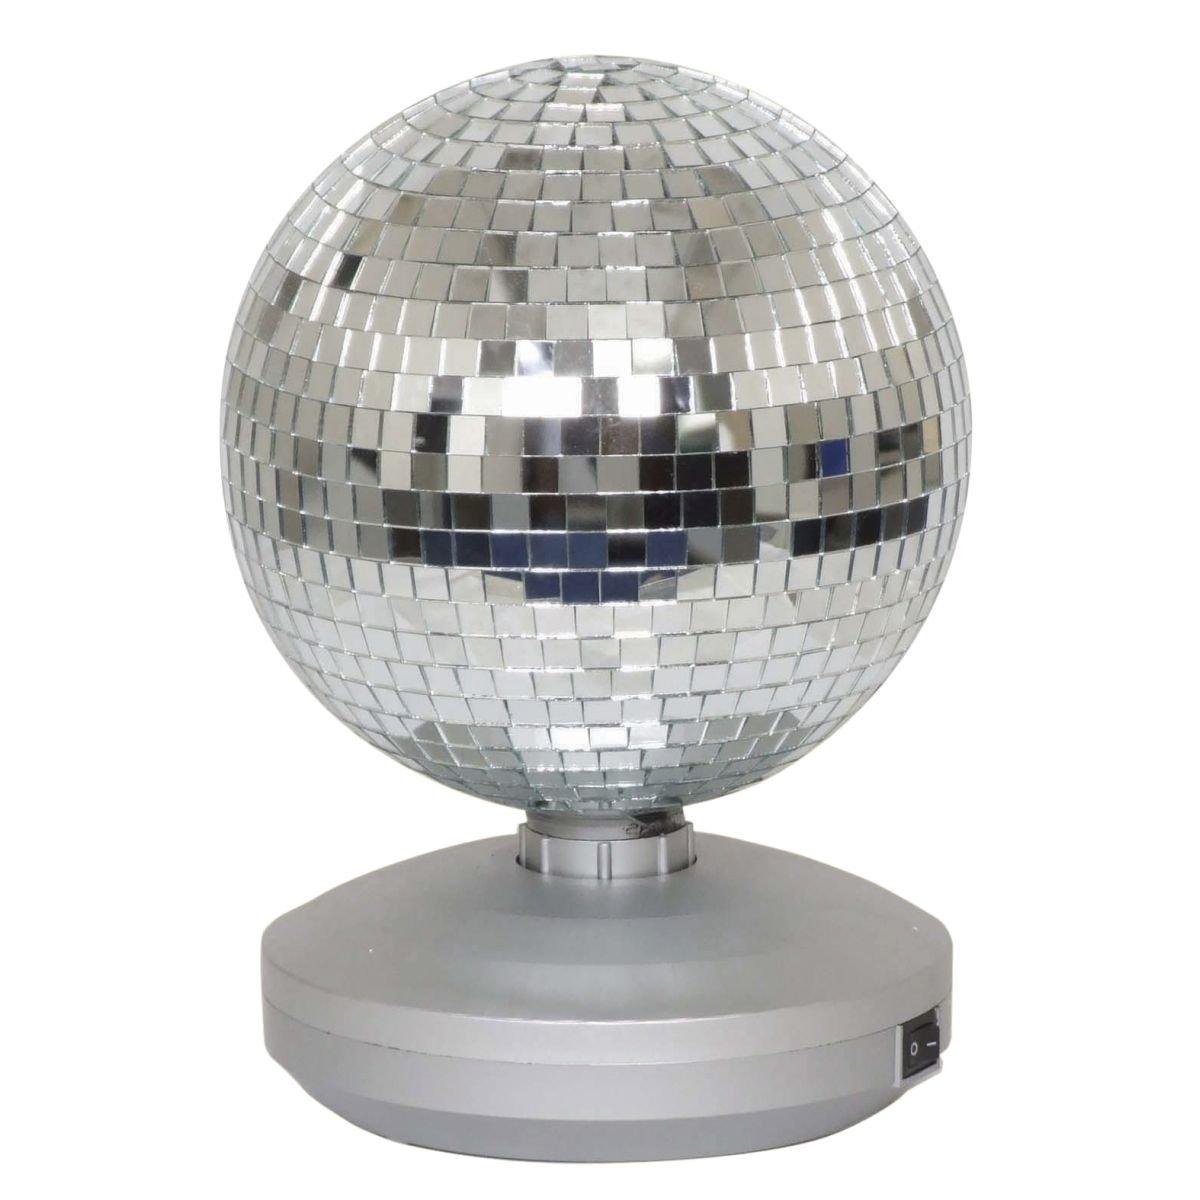 8' Free Standing Mirror Ball Dance Party Set Cheetah G017KD